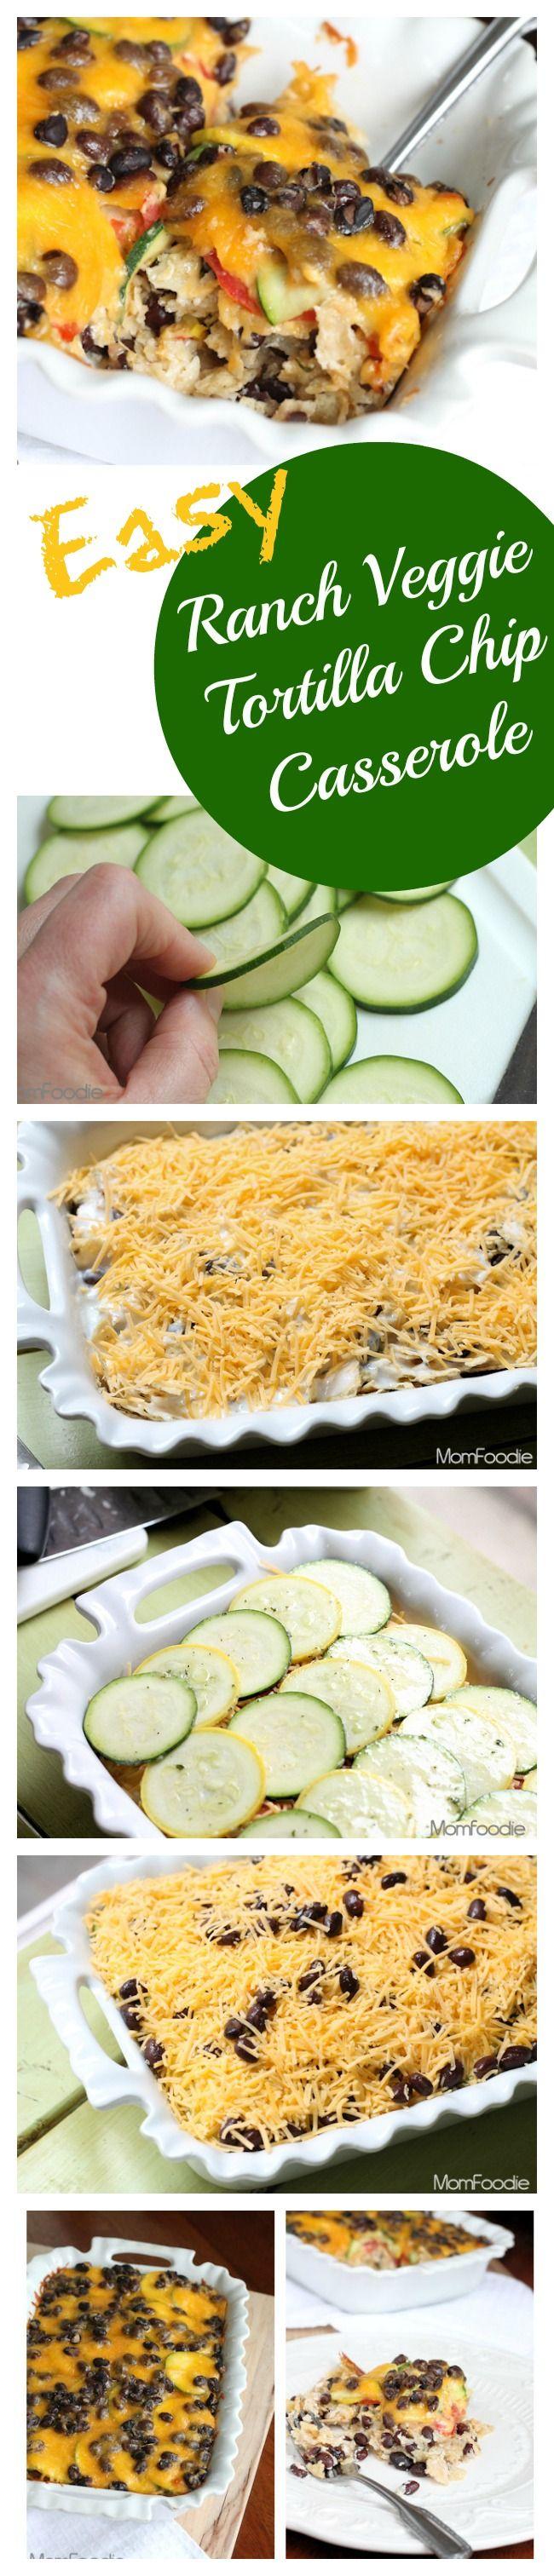 Ranch Black Bean & Veggie Tortilla Casserole Recipe